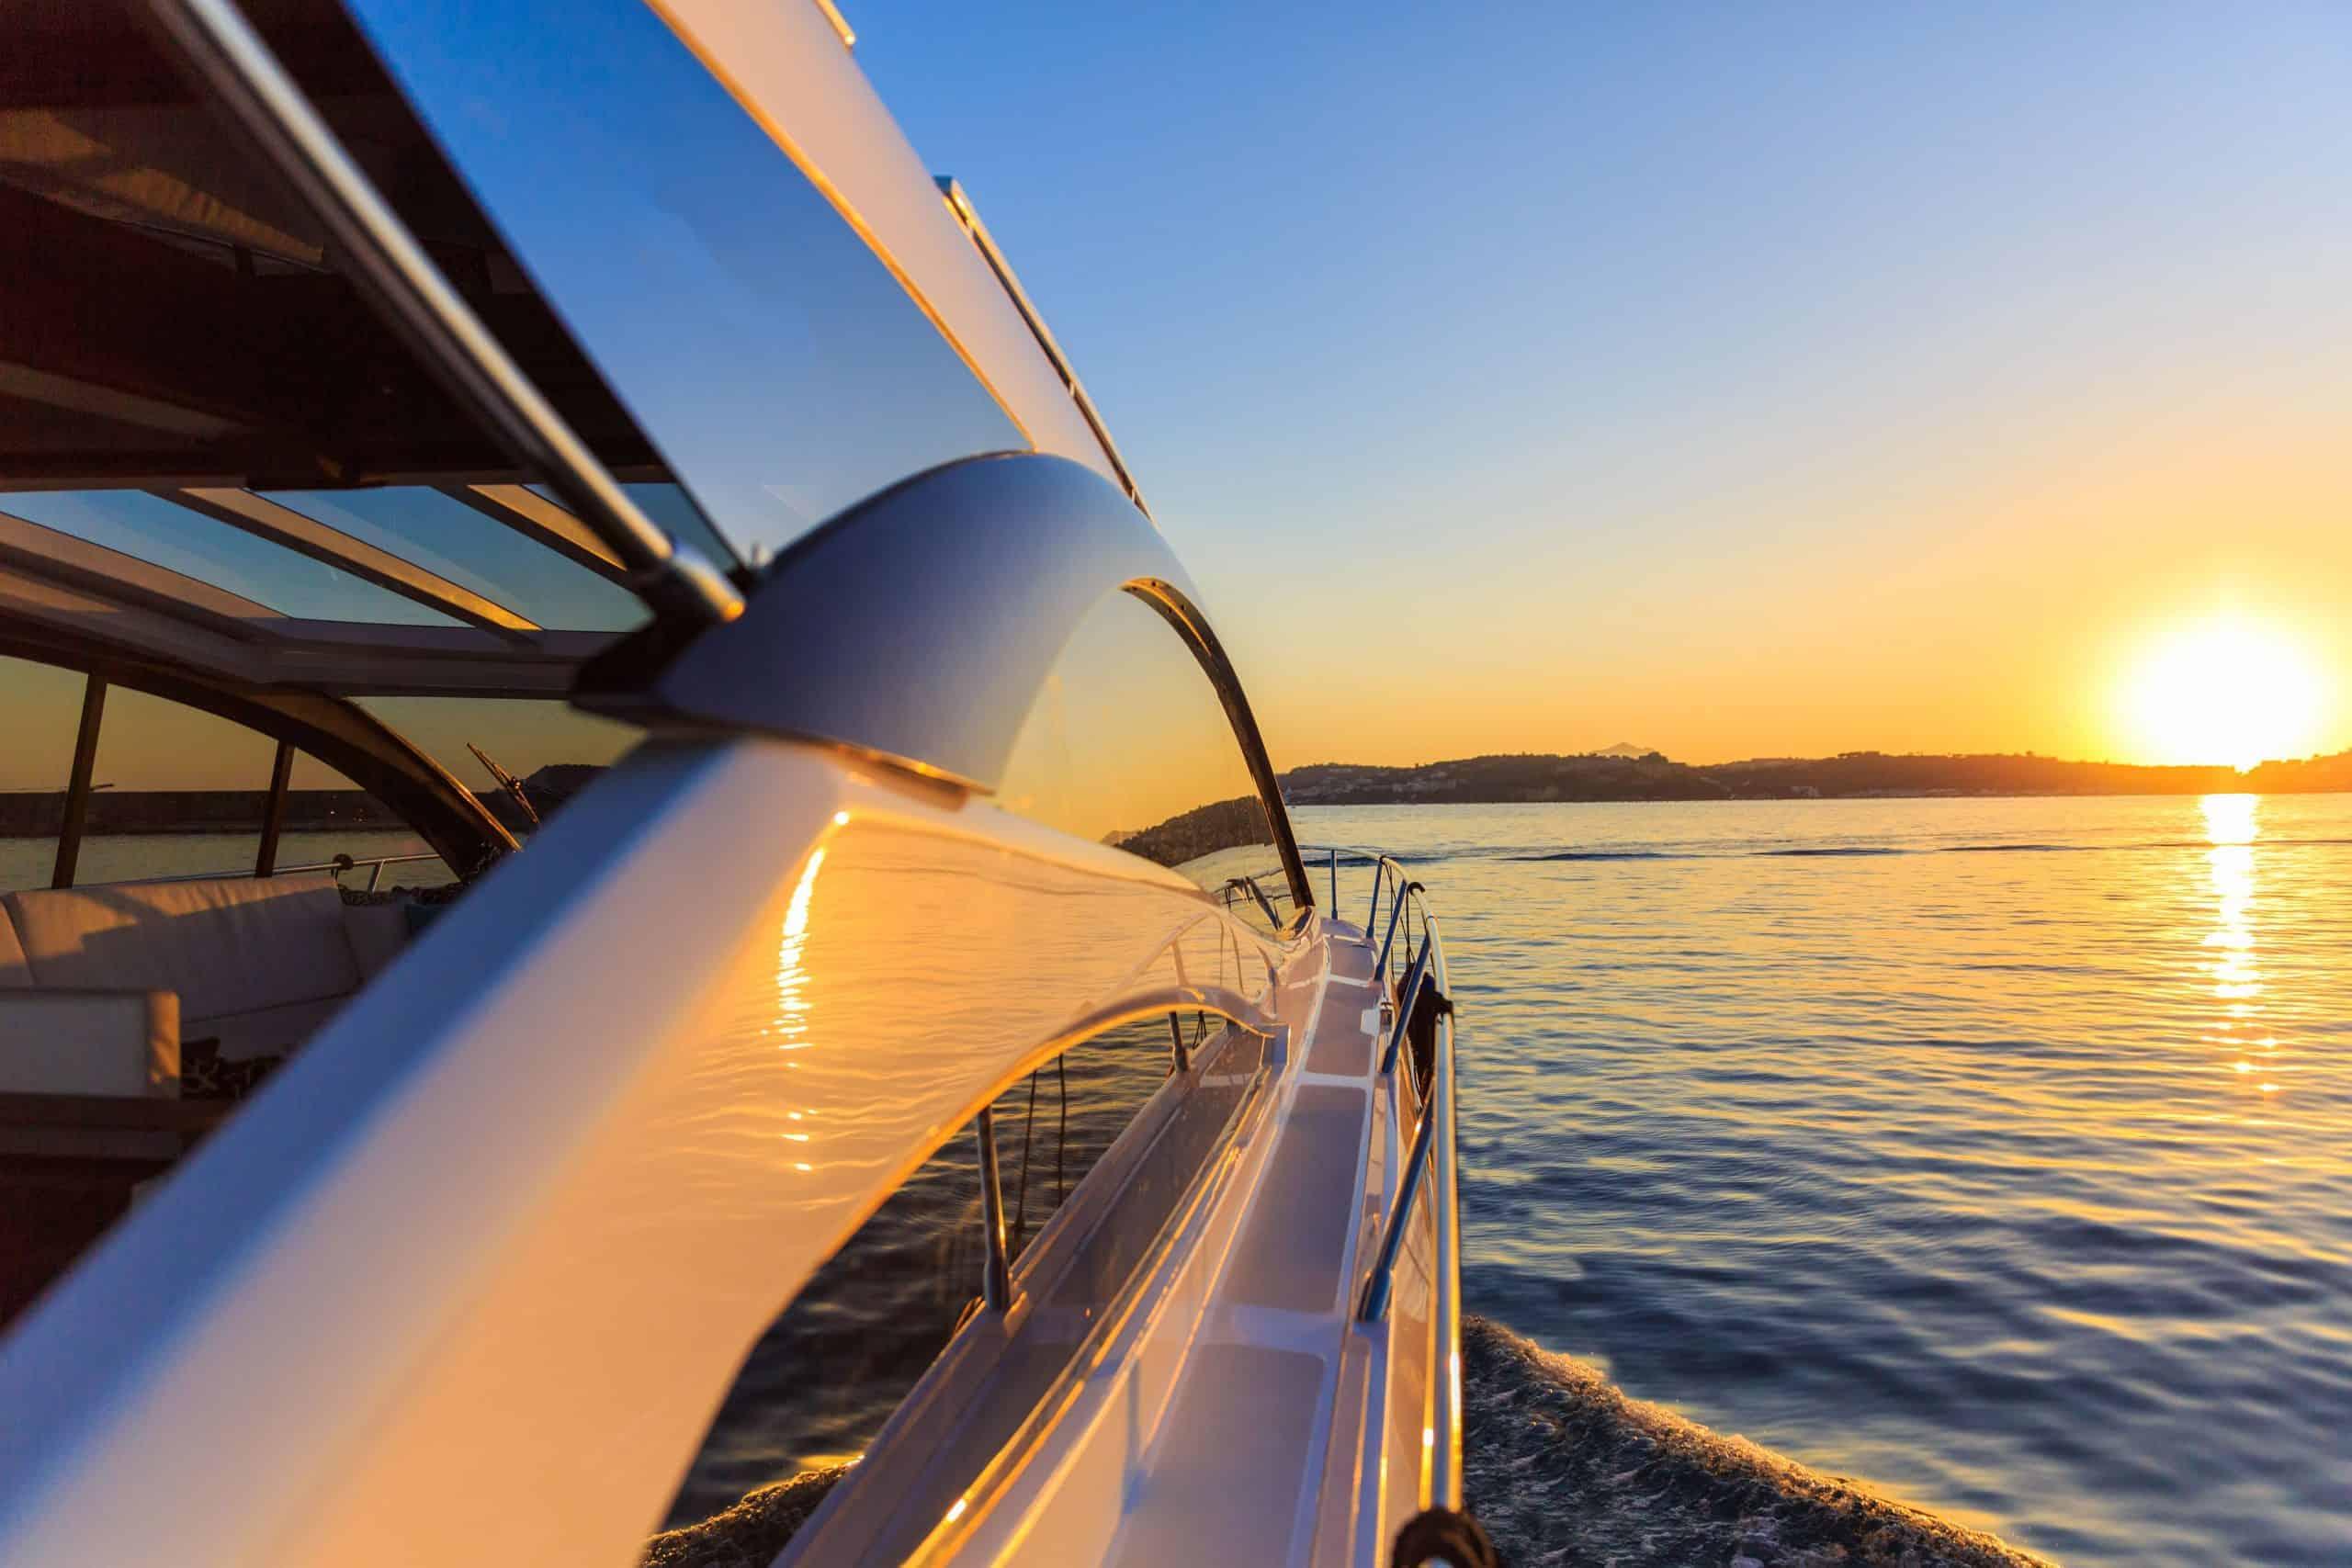 Superyacht at Sunset